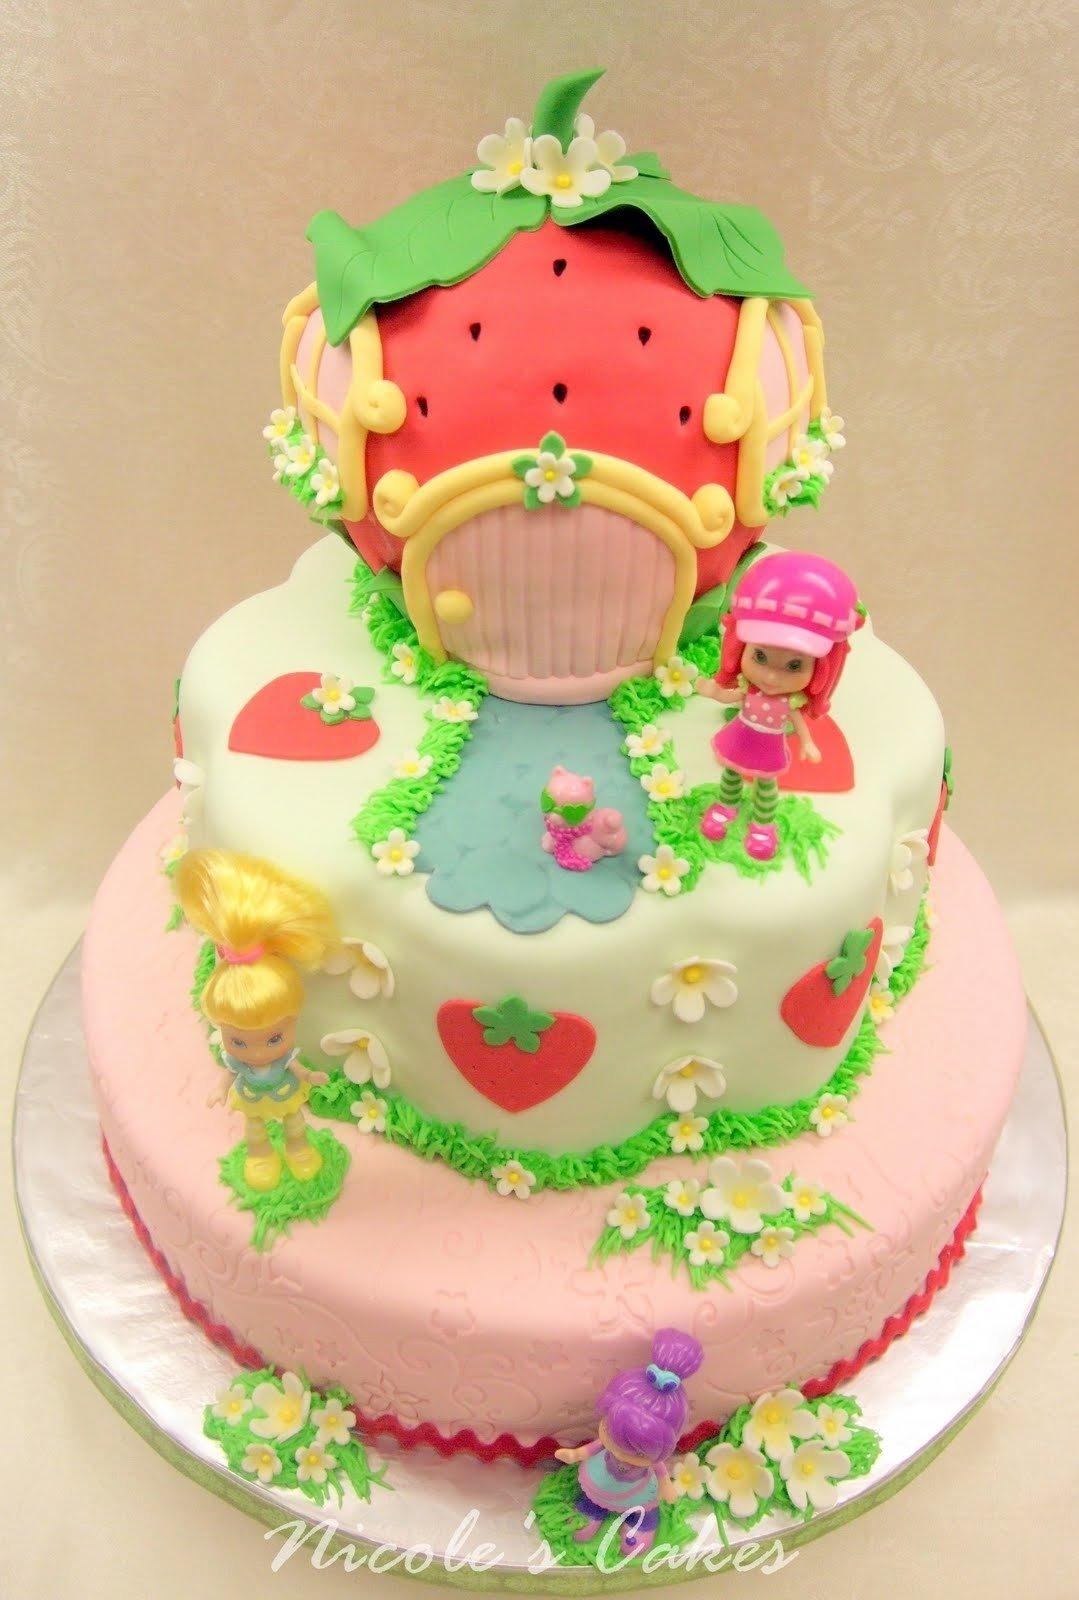 10 Attractive Strawberry Shortcake Birthday Cake Ideas on birthday cakes a berry beautiful strawberry shortcake birthday cake 2020